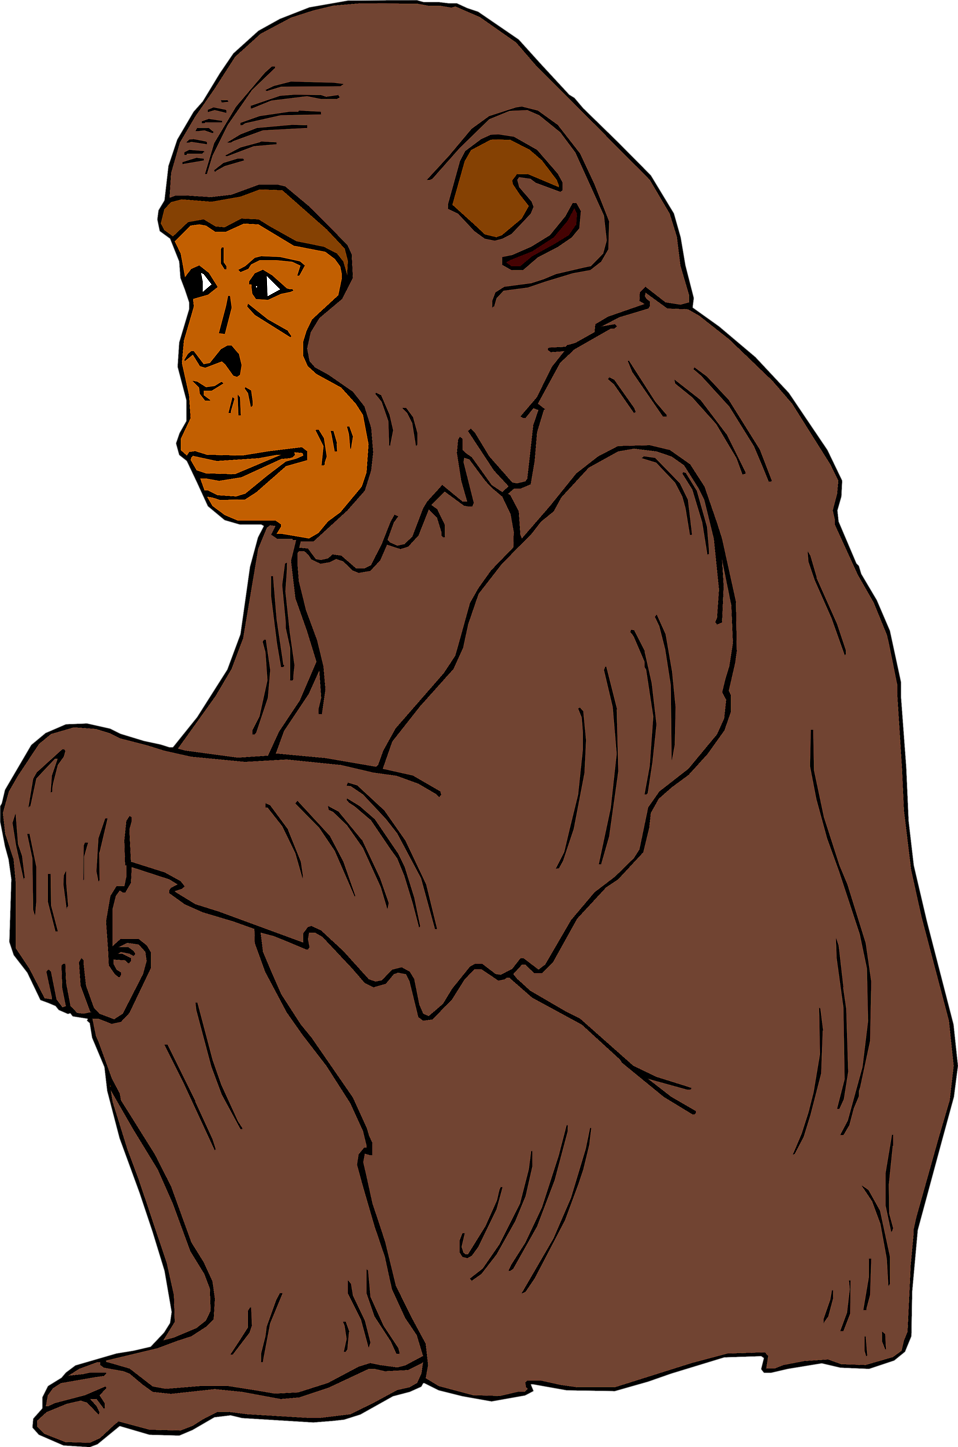 clip download Ape clipart chimpanzee. Free stock photo illustration